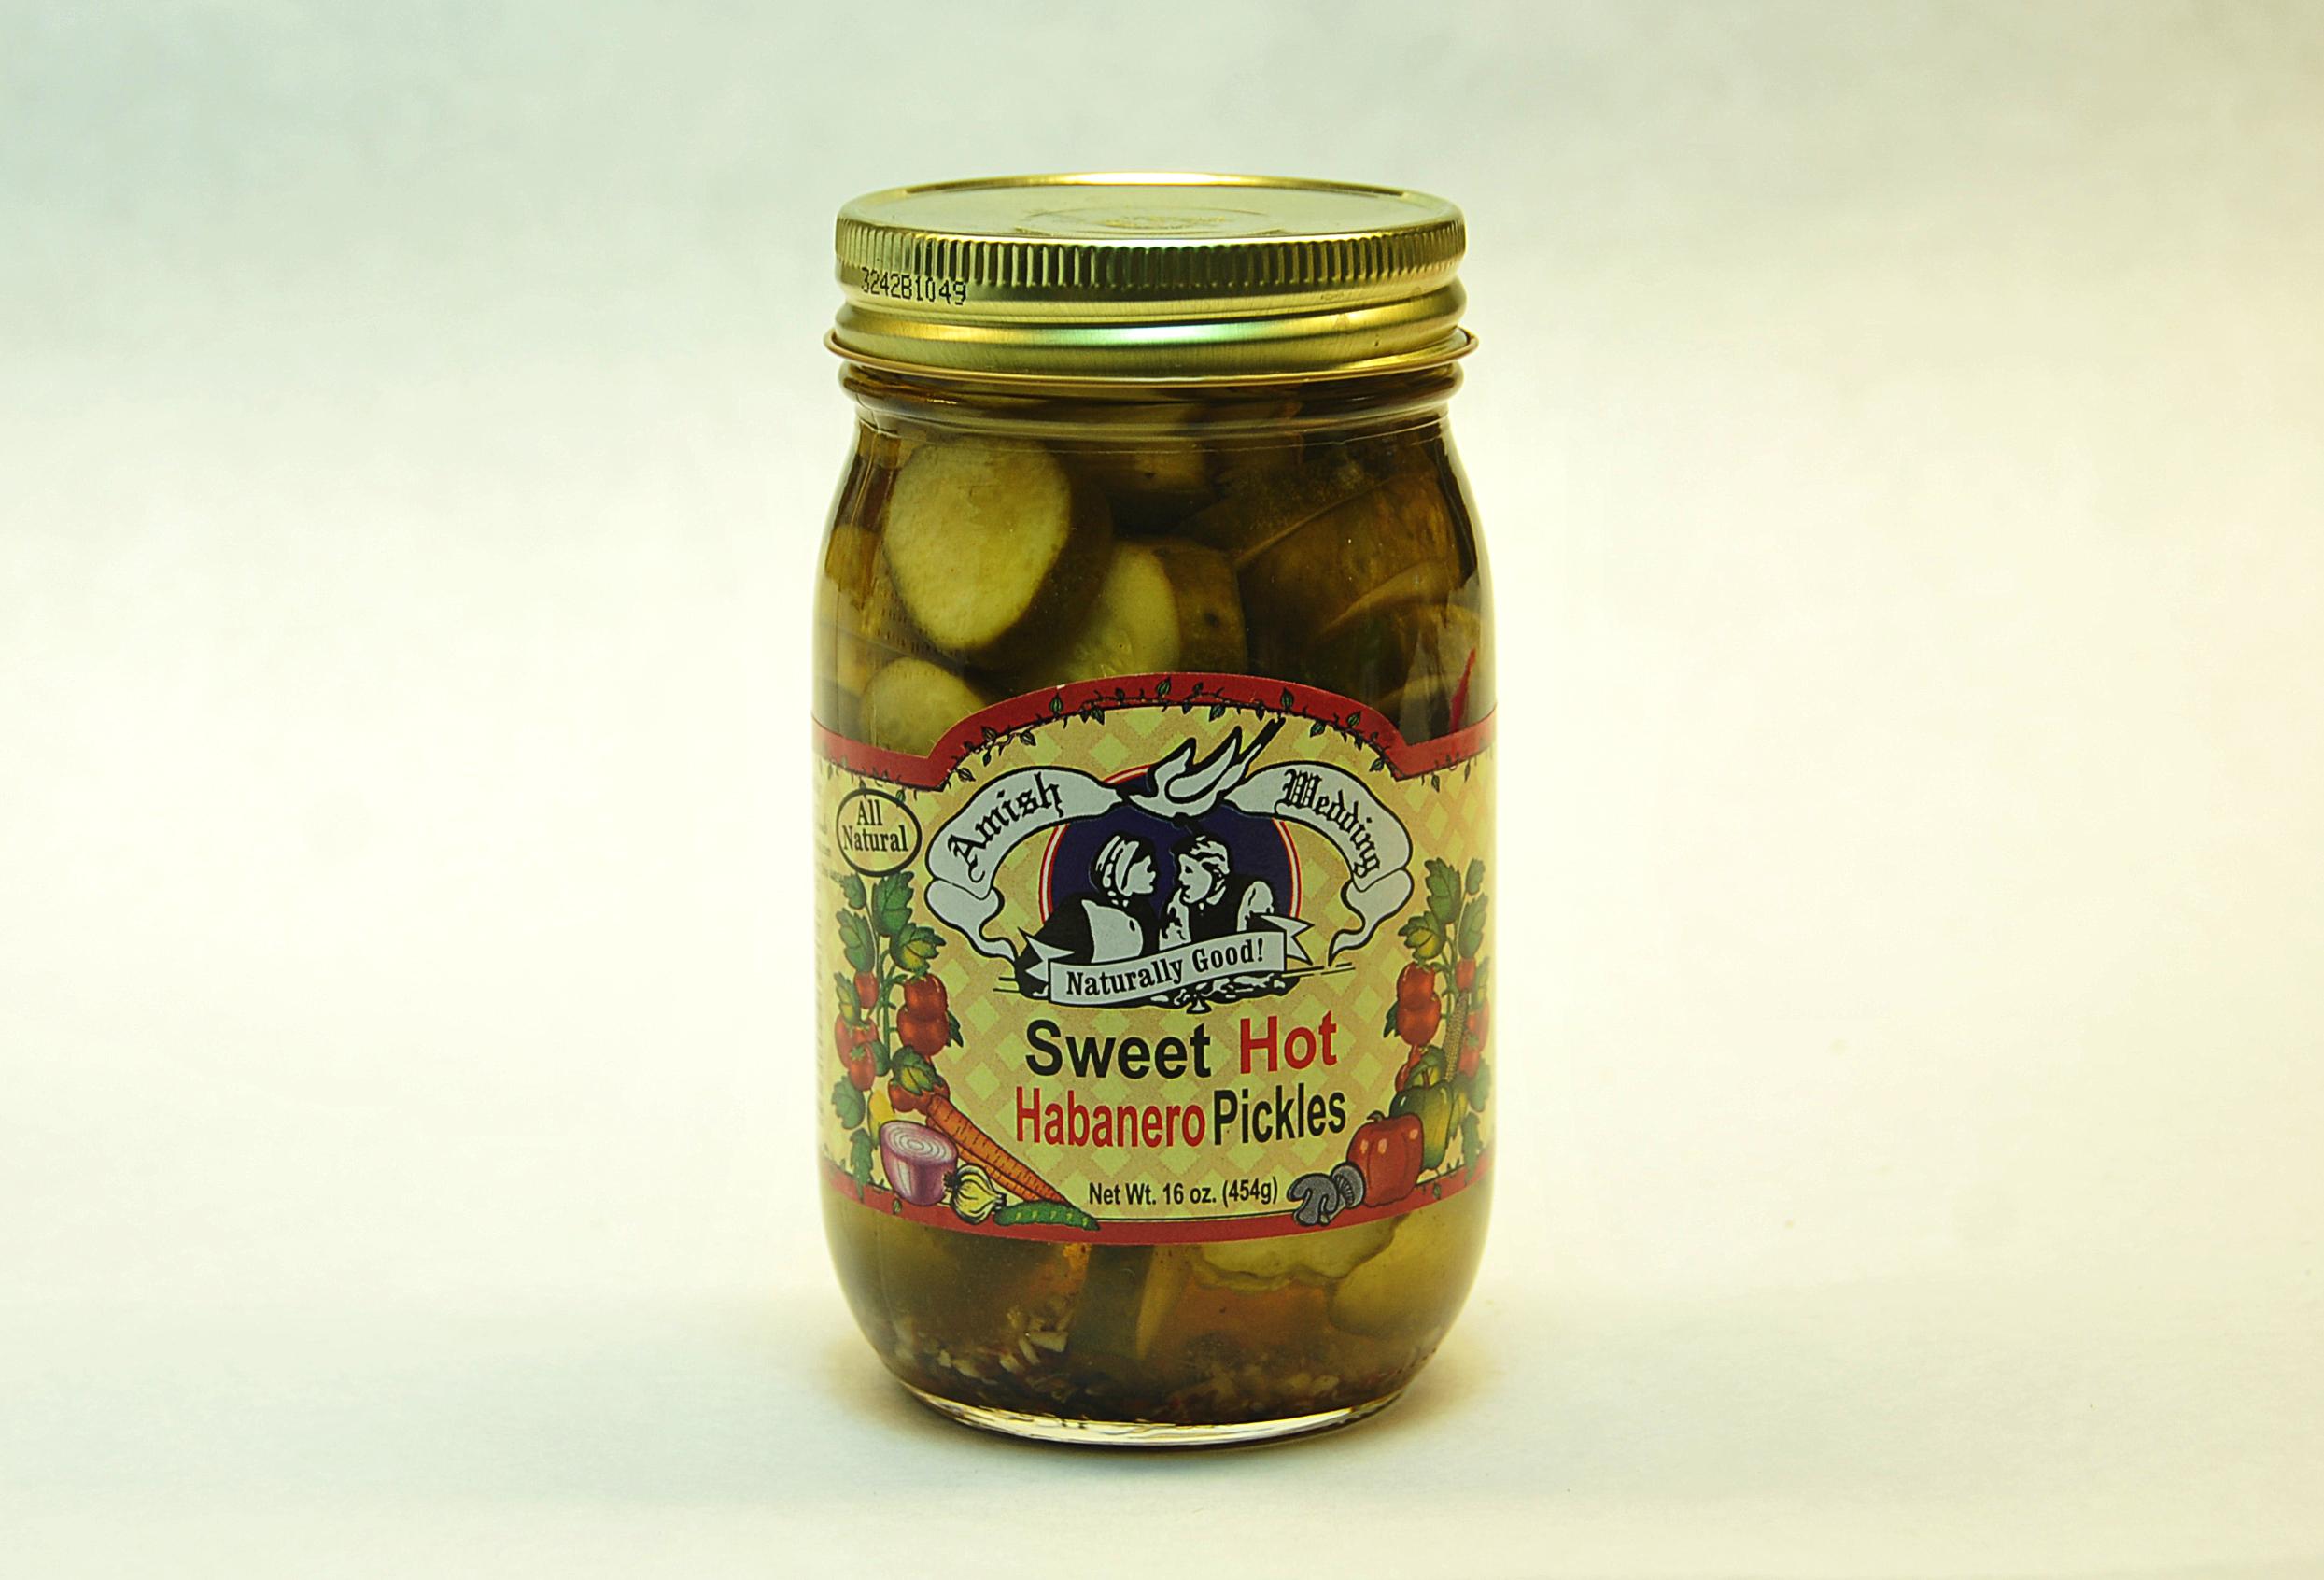 Sweet Hot Habanero Pickles - Taste of Amish